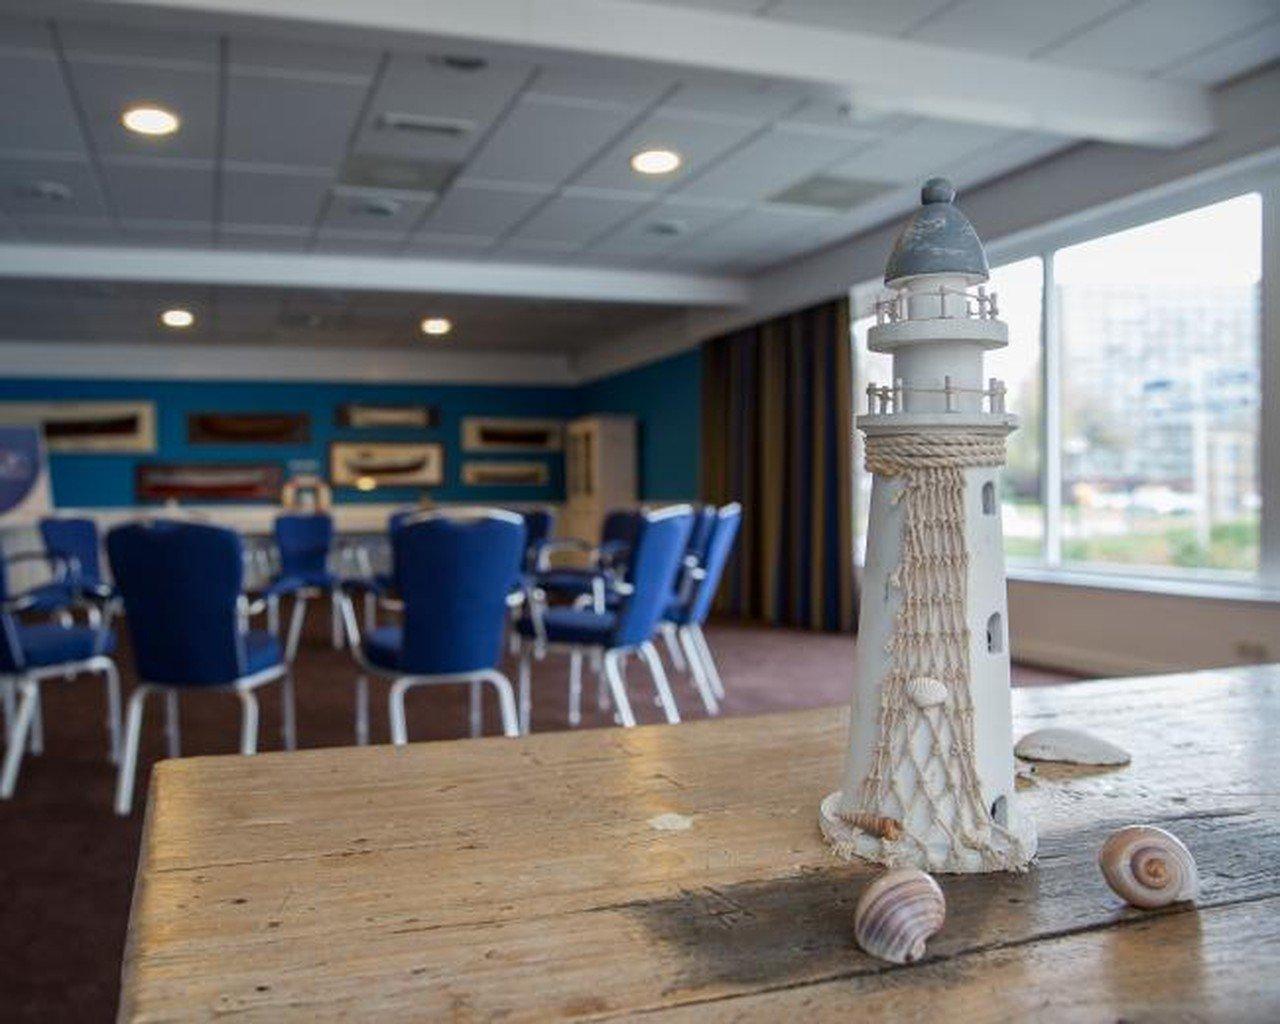 Rotterdam conference rooms Salle de réunion Delta Hotel - Nautilus image 0